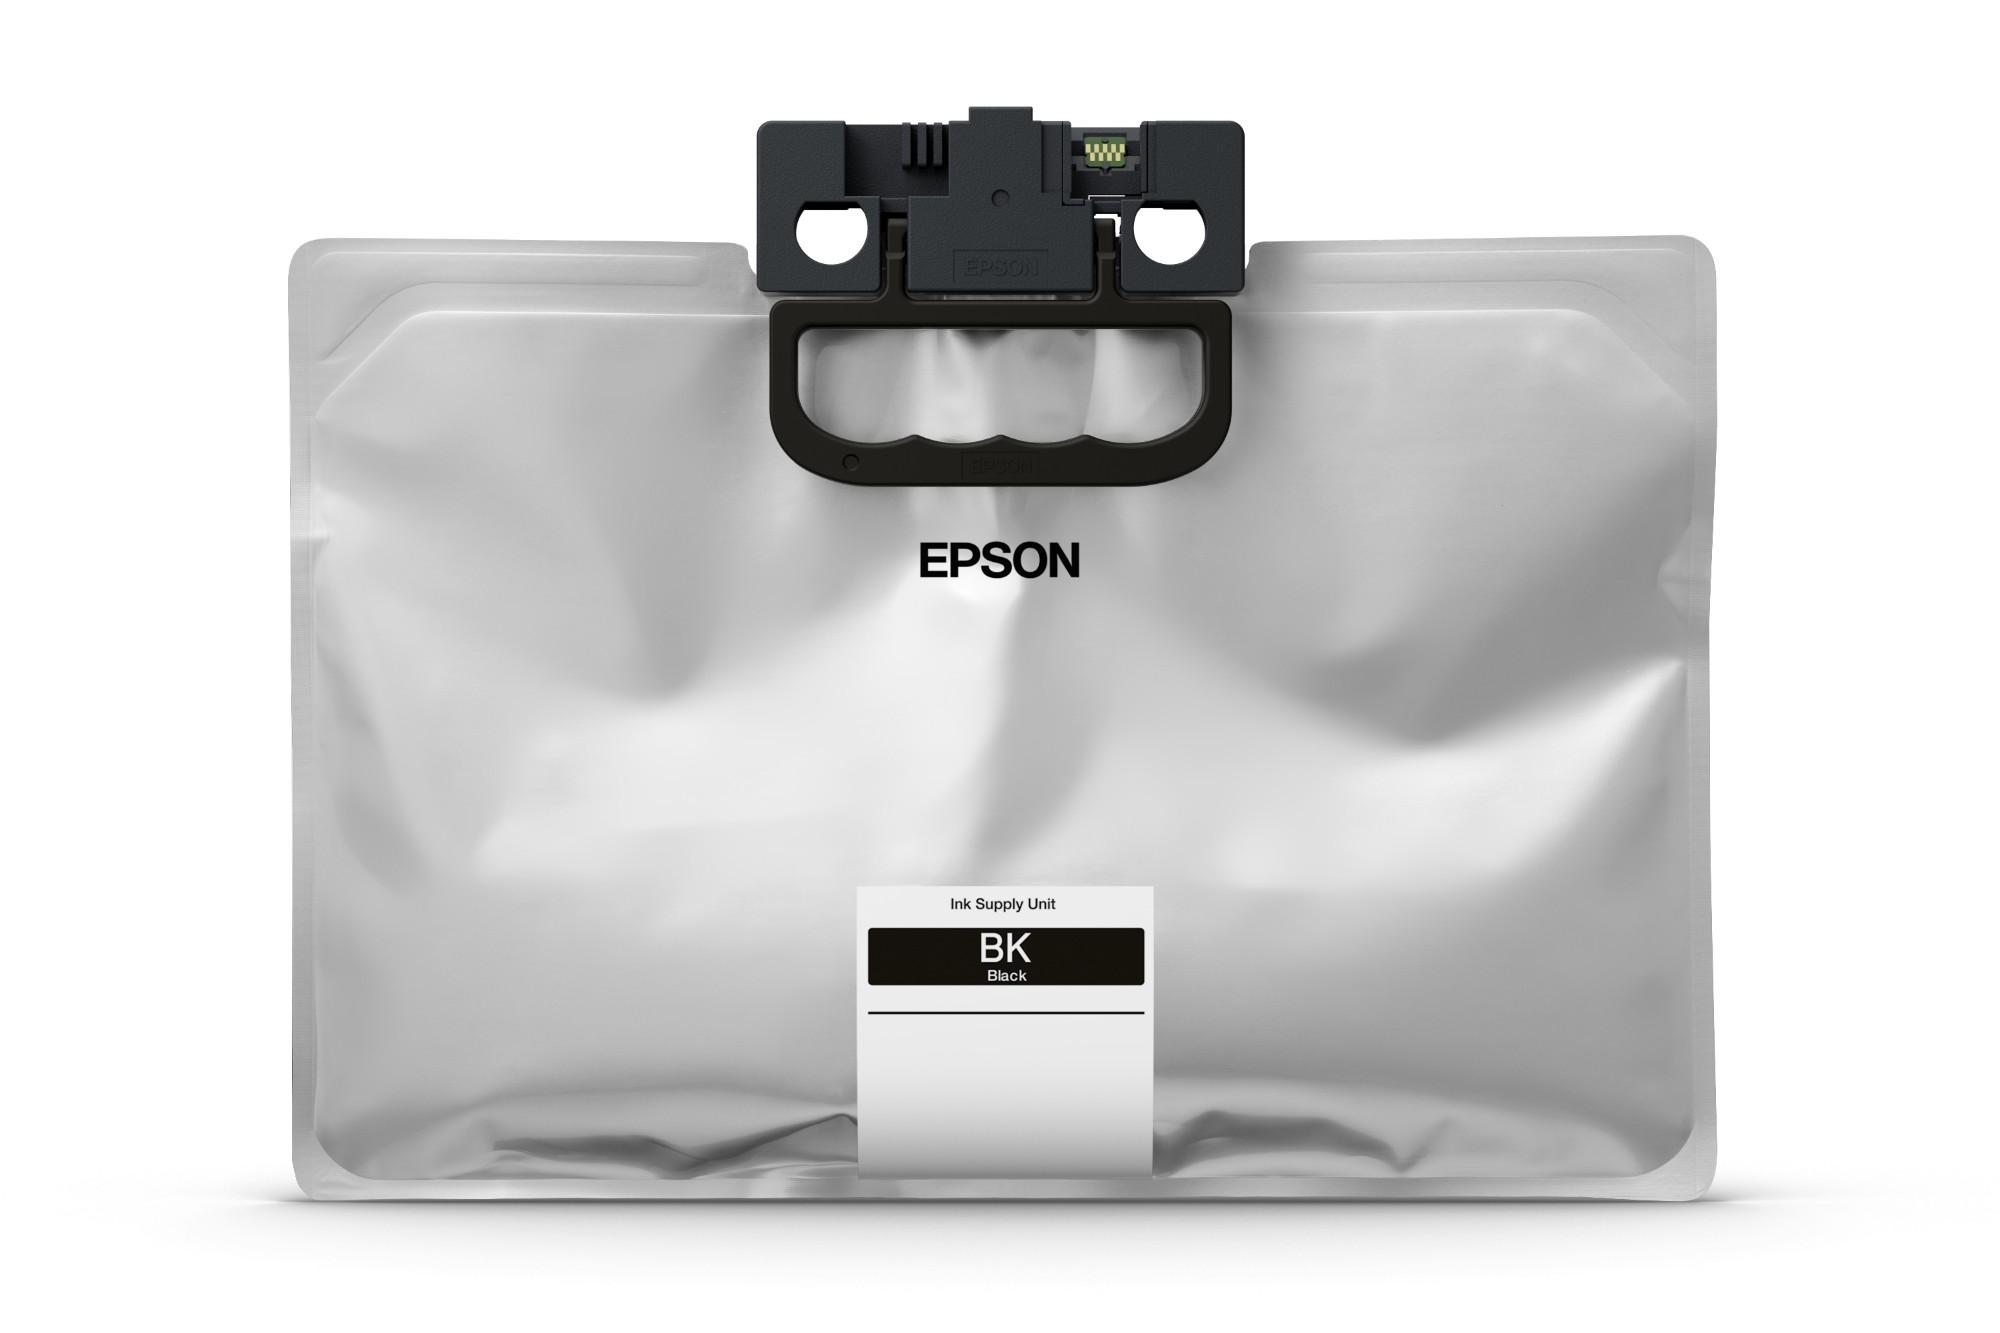 Epson WorkForce Pro WF-C529R / C579R Black XXL Ink Supply Unit